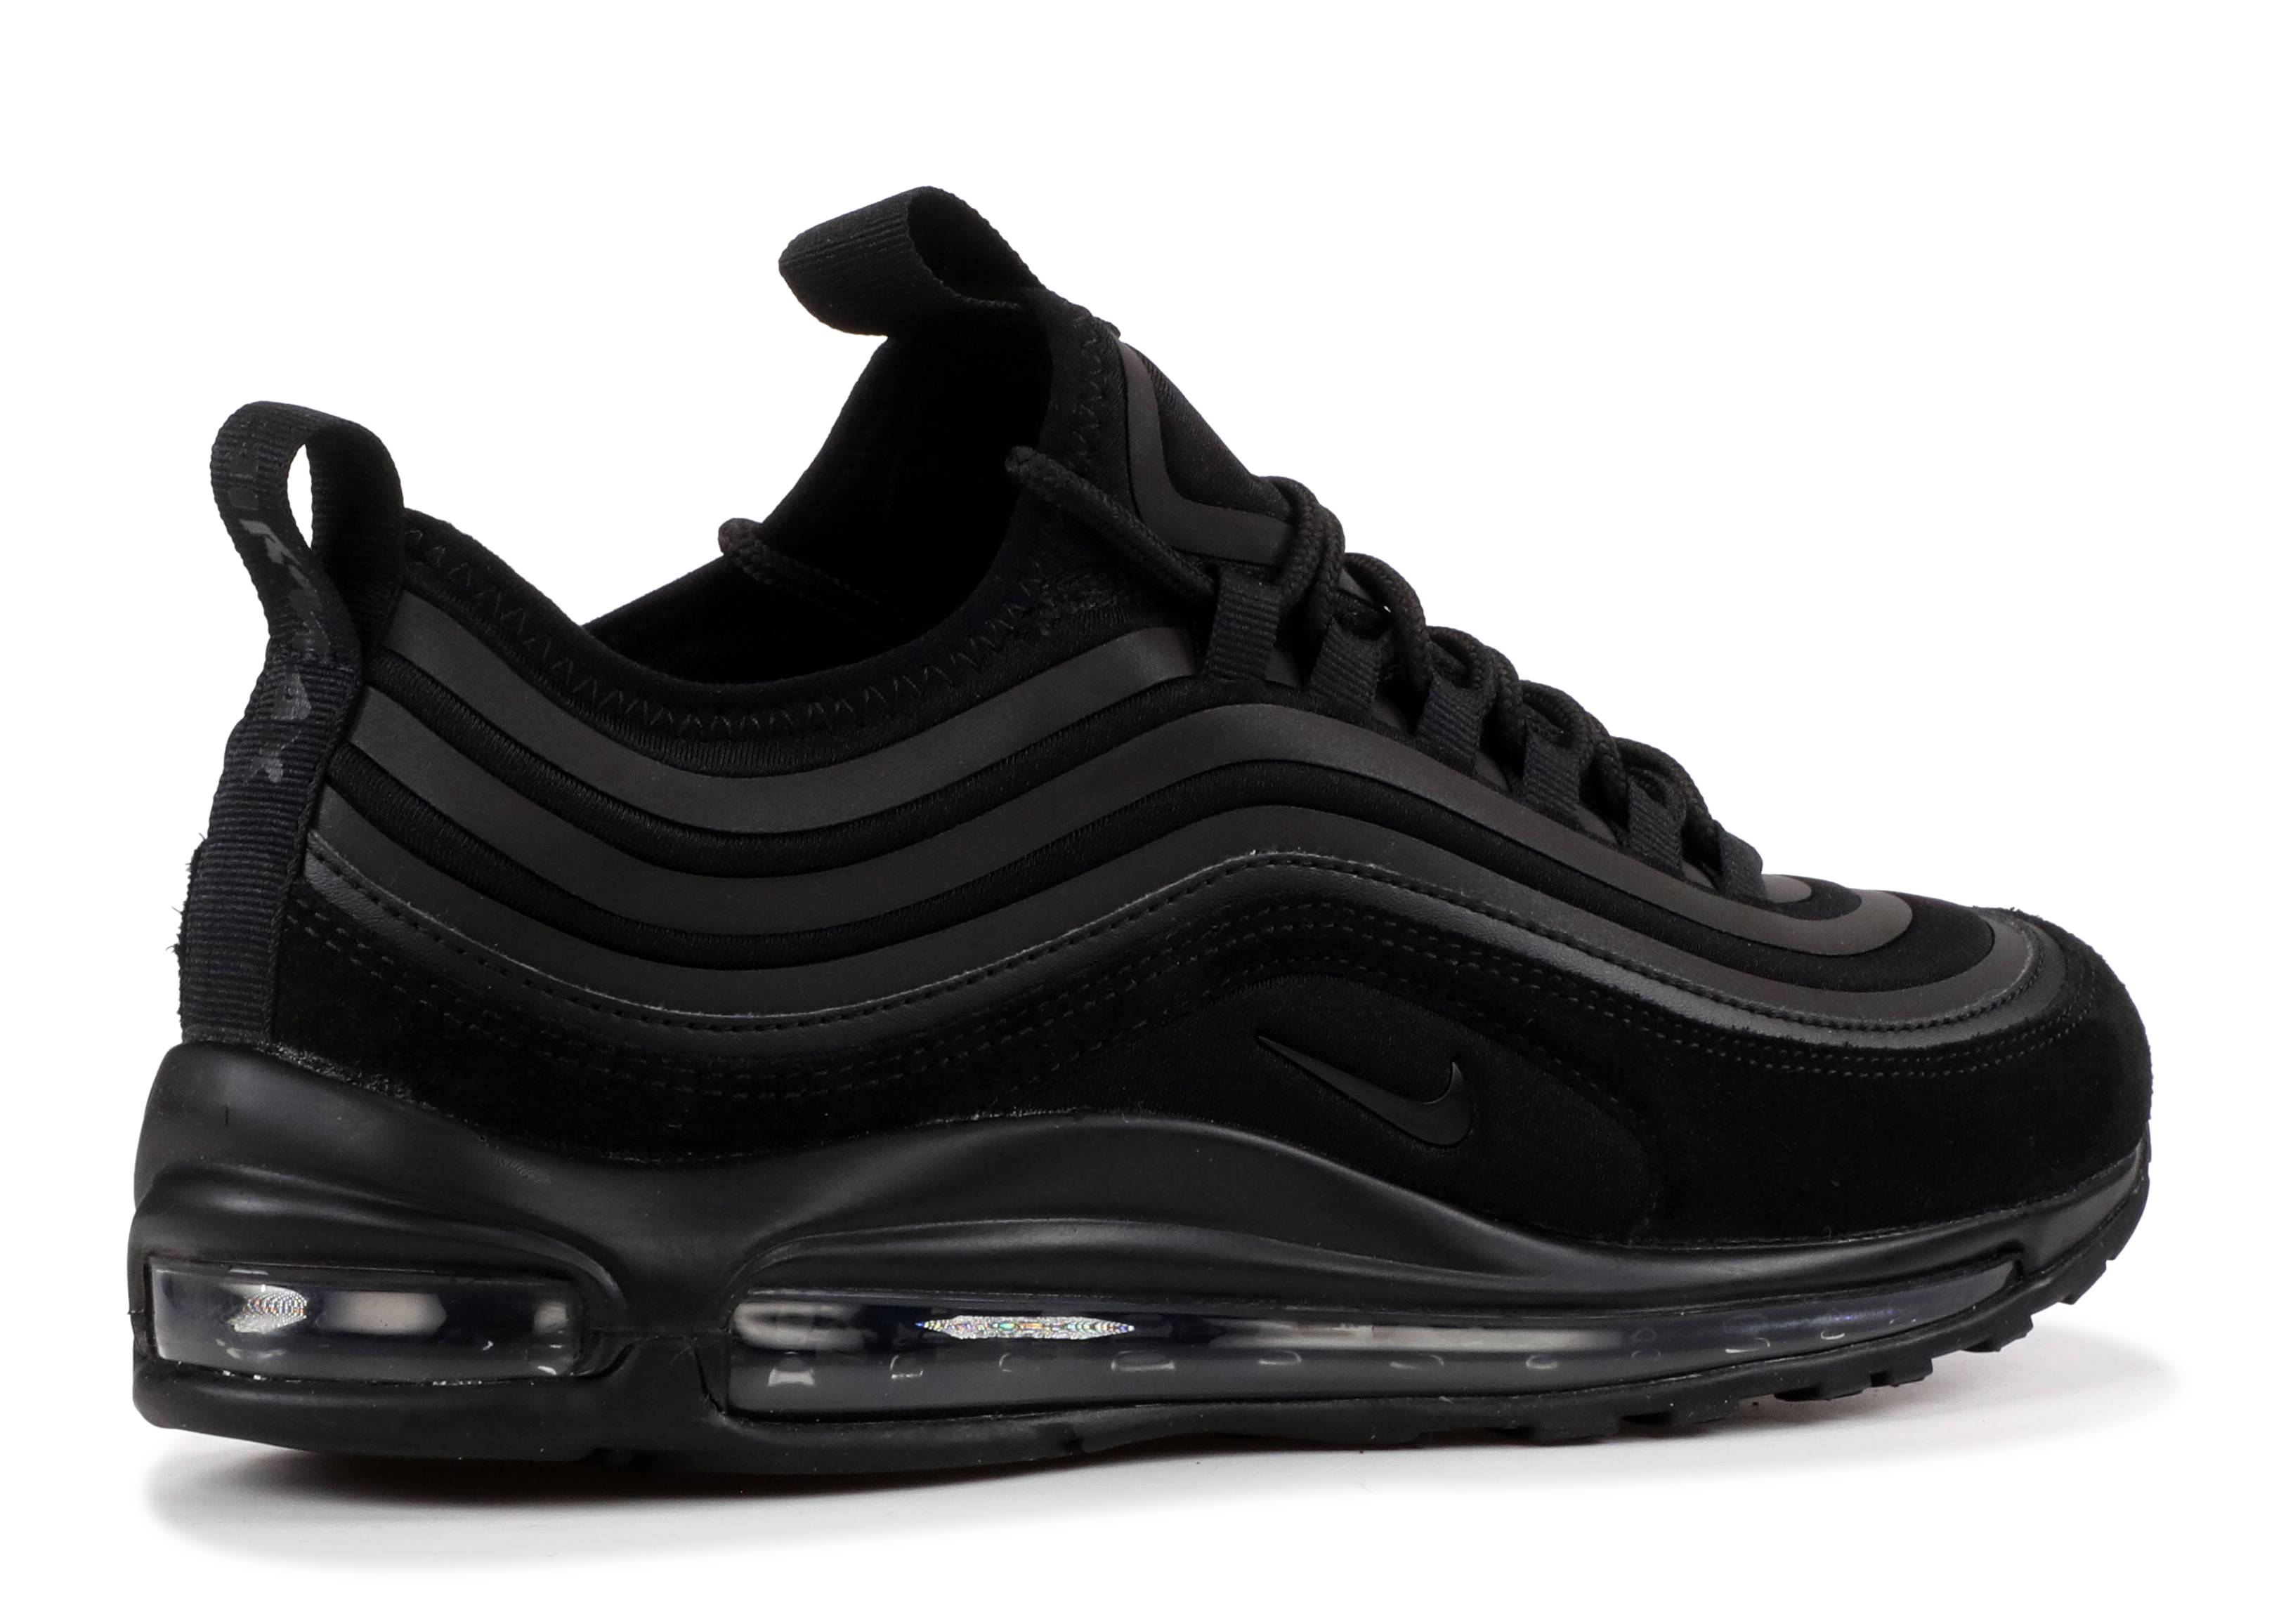 cdfee95e404 ... popular brand Air Max 97 UL 17 SE - Nike - 924452 001 - black black ...